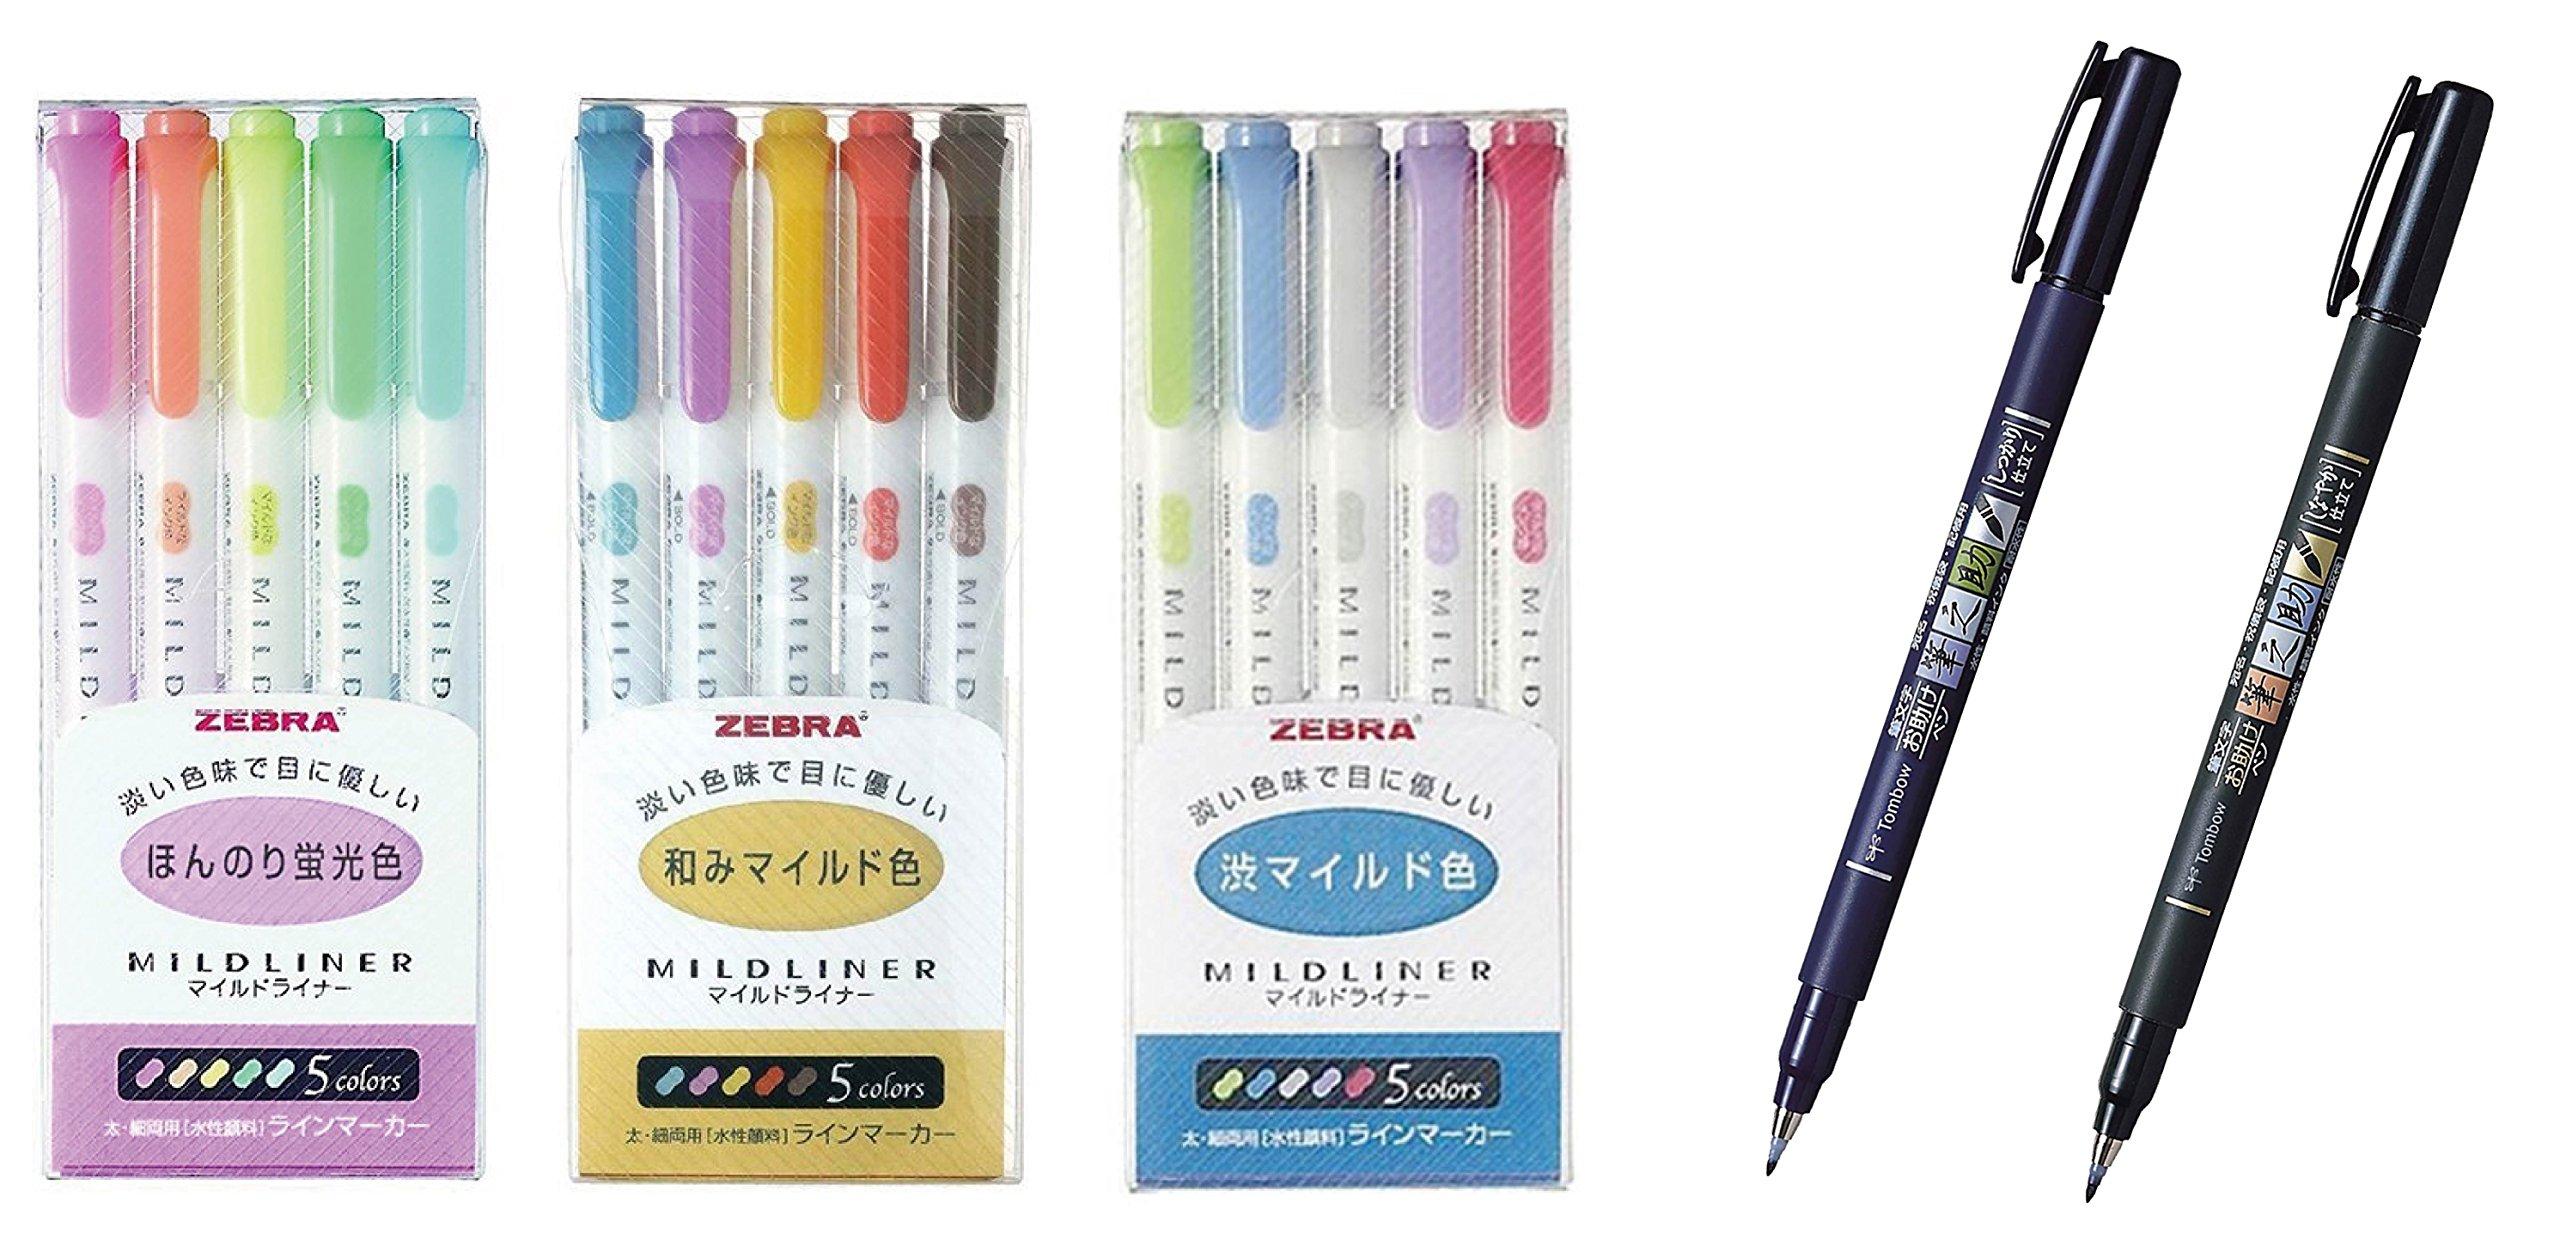 Zebra Mildliner 15 Color Full Set & Tombow Fudenosuke Brush Pen - Hard Type x 1 & Soft Type x 1/Value set with an Original Paperclip